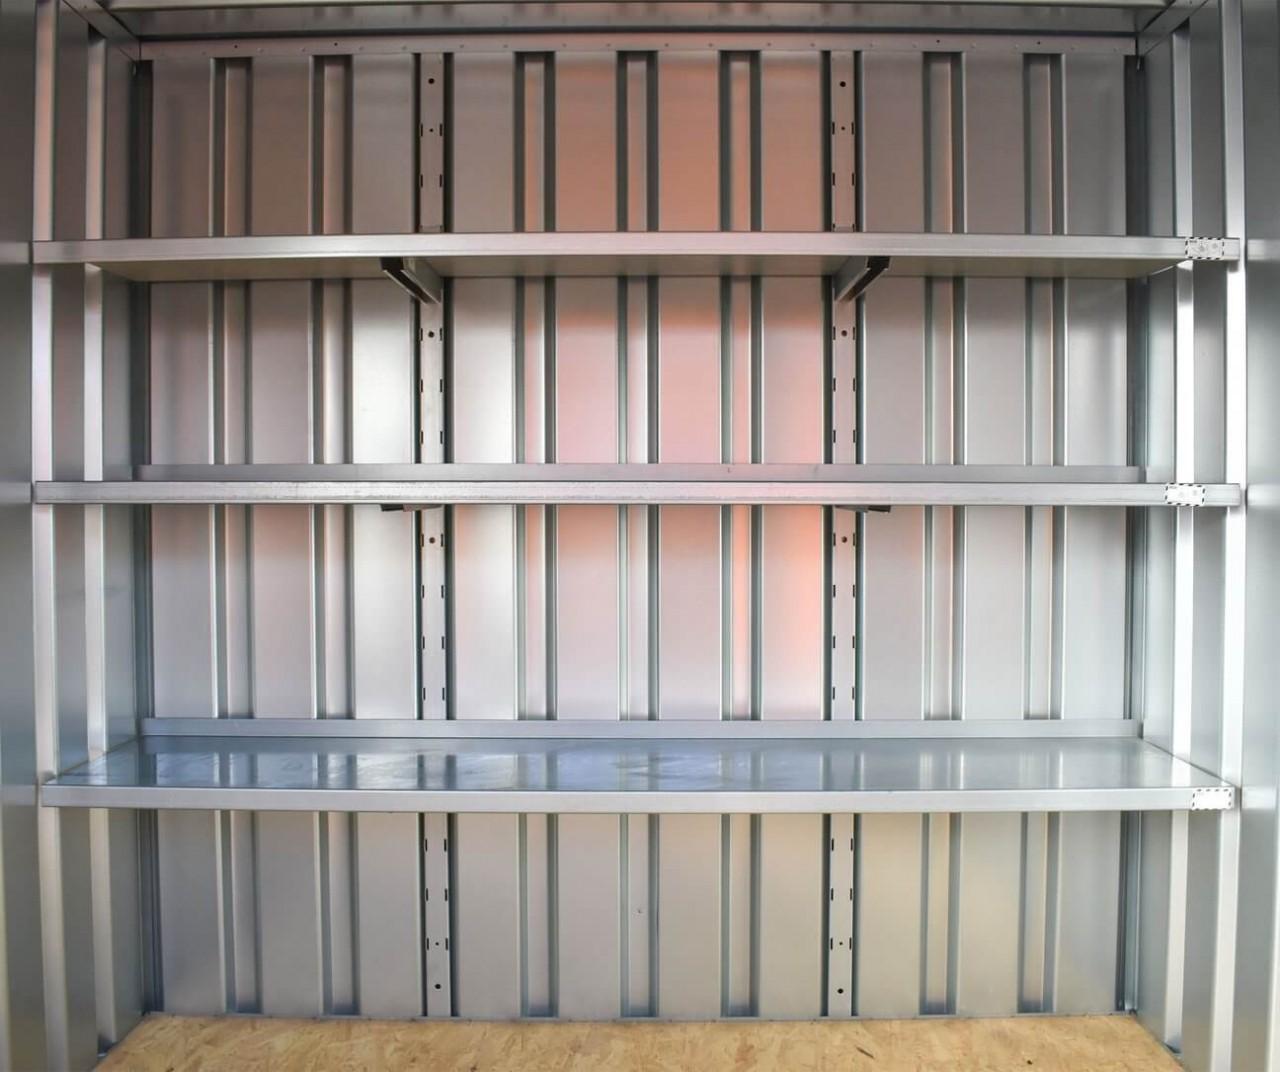 Containerregal, 420mm tief, 3 Lagerebenen